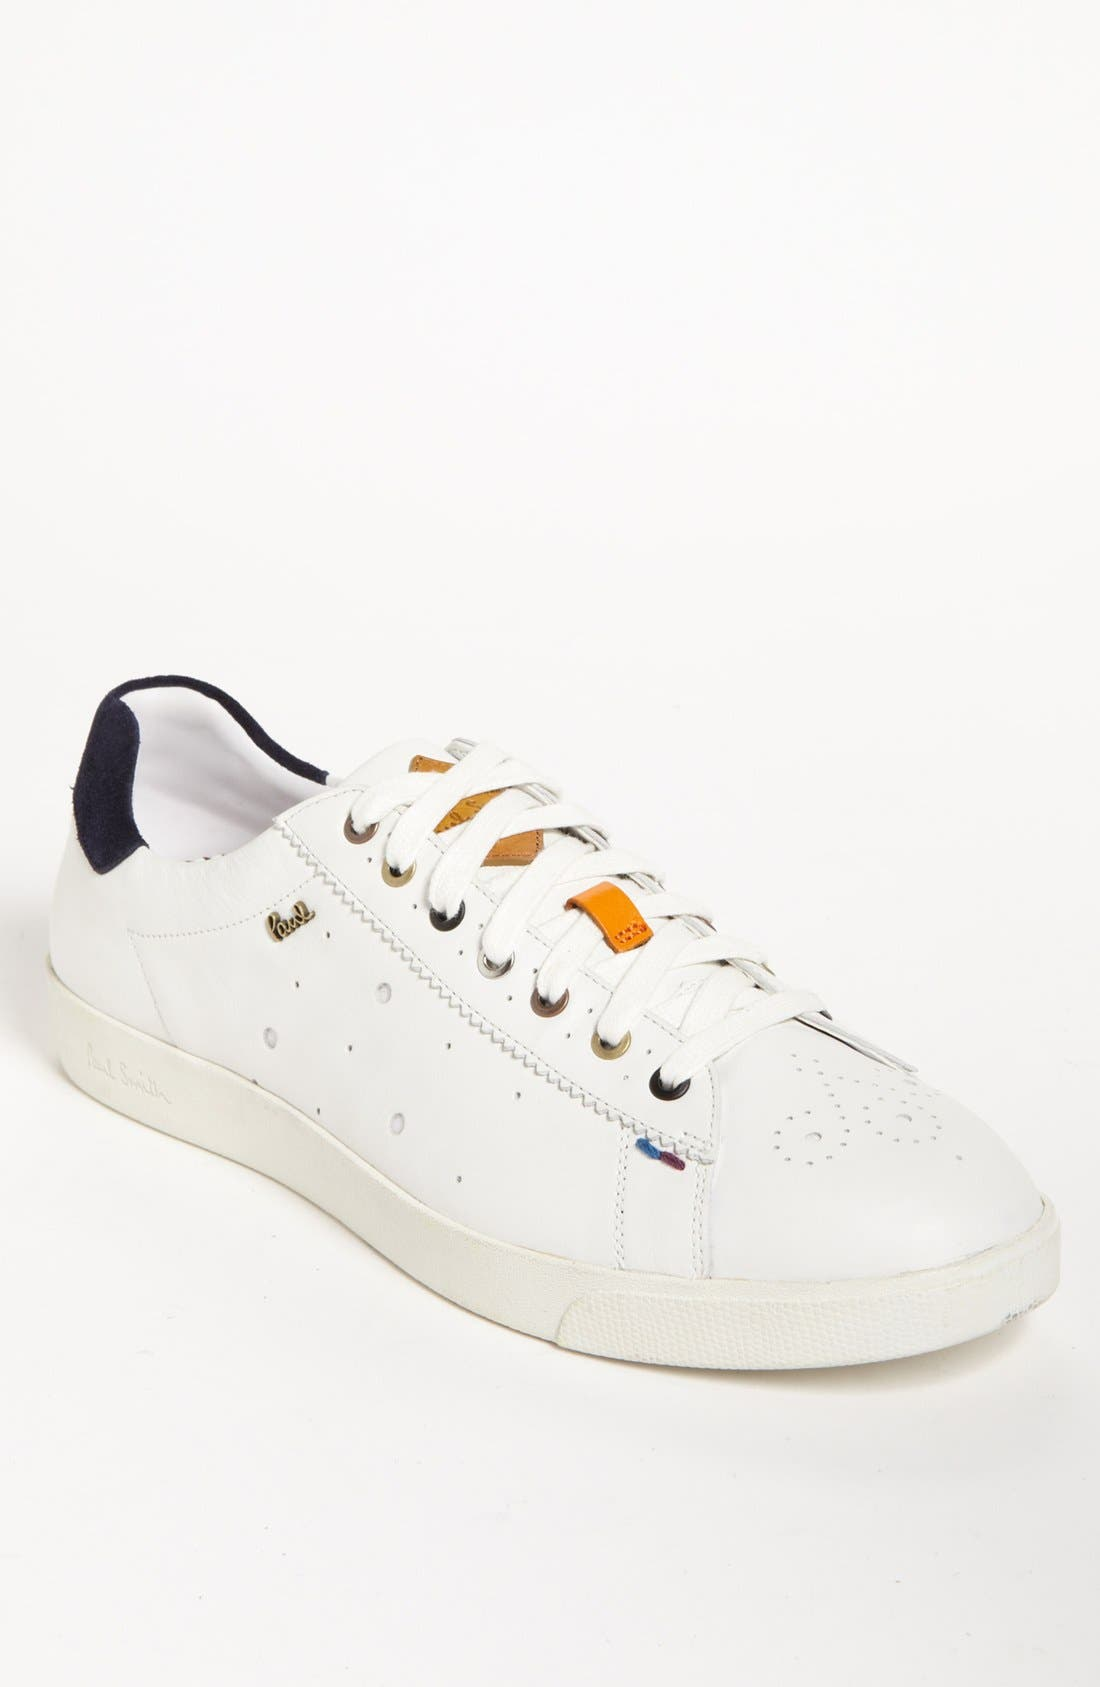 Alternate Image 1 Selected - Paul Smith 'Lepus' Sneaker